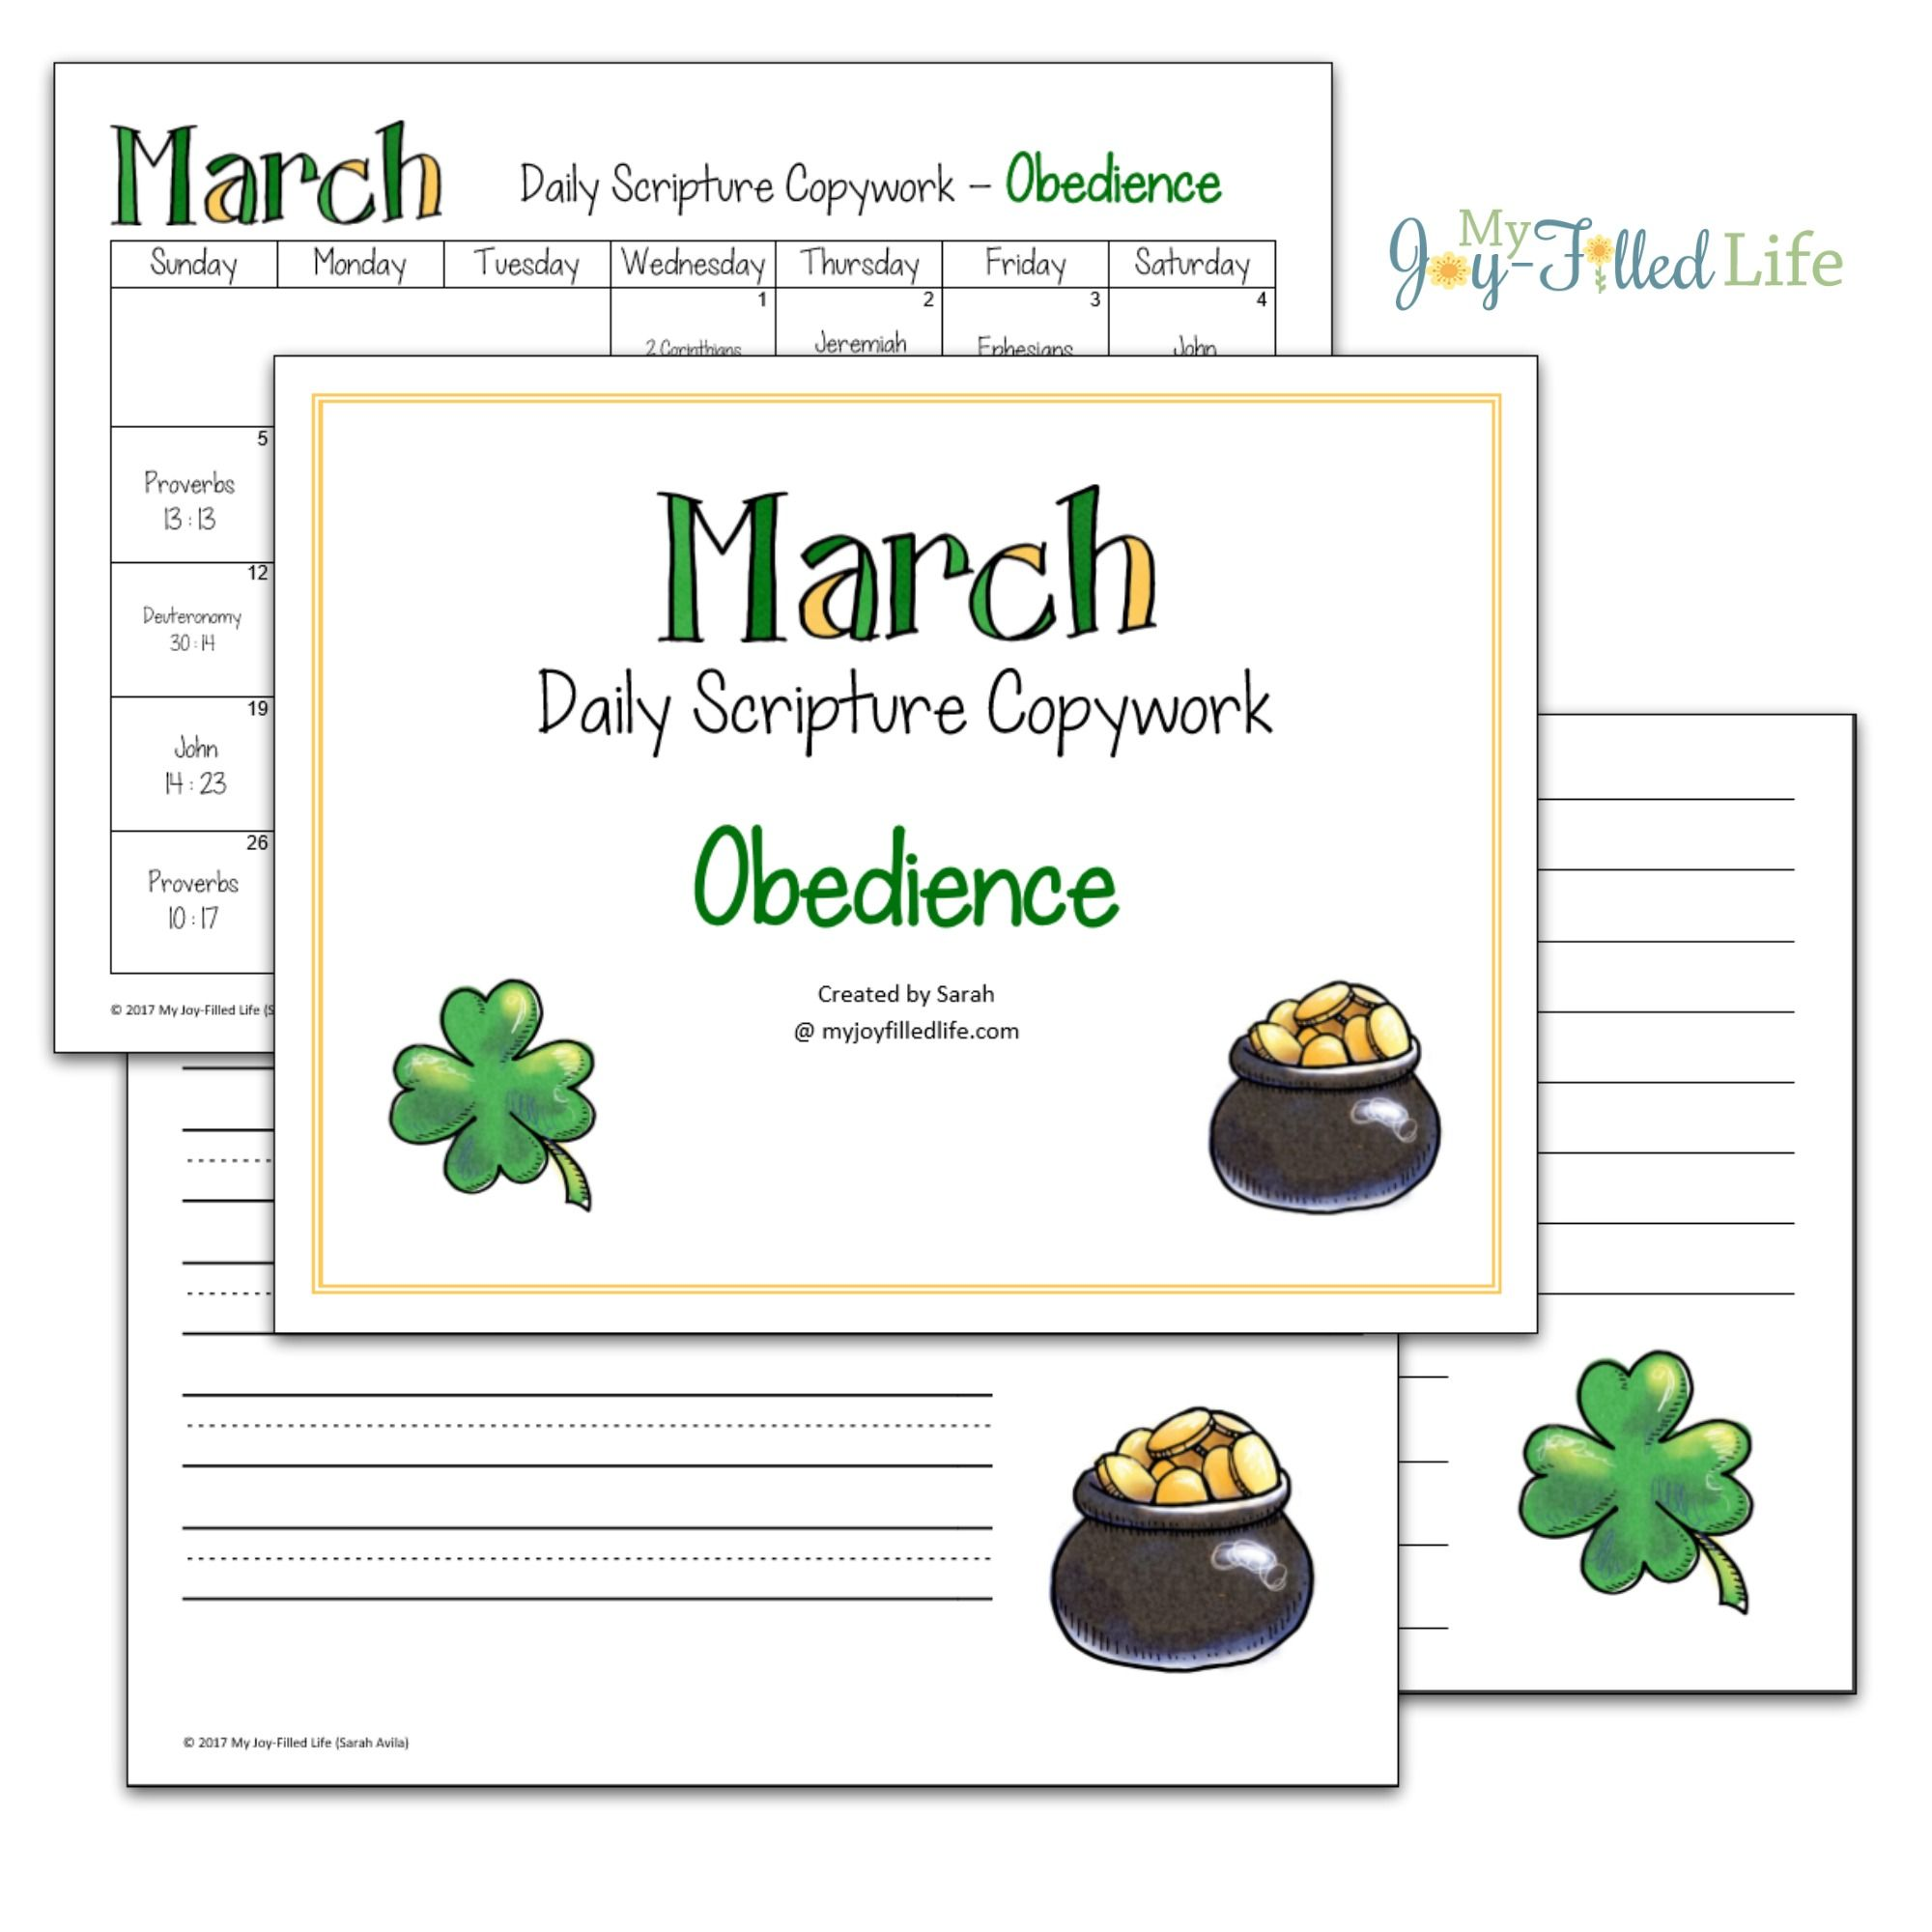 Daily Scripture Copywork Calendar For March